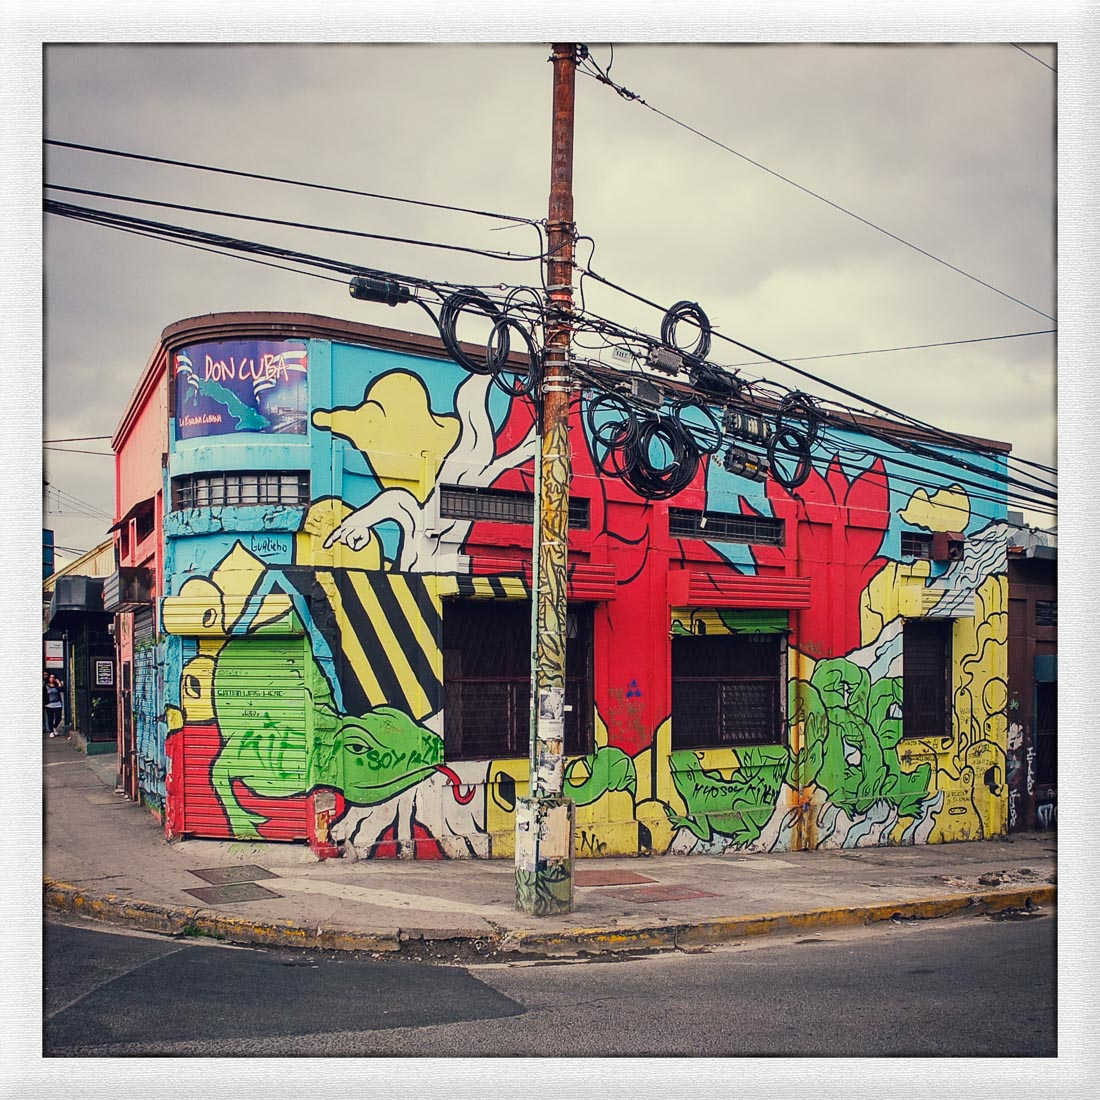 San Jose Street Art I (c) Michael Putzlocher Photography-32